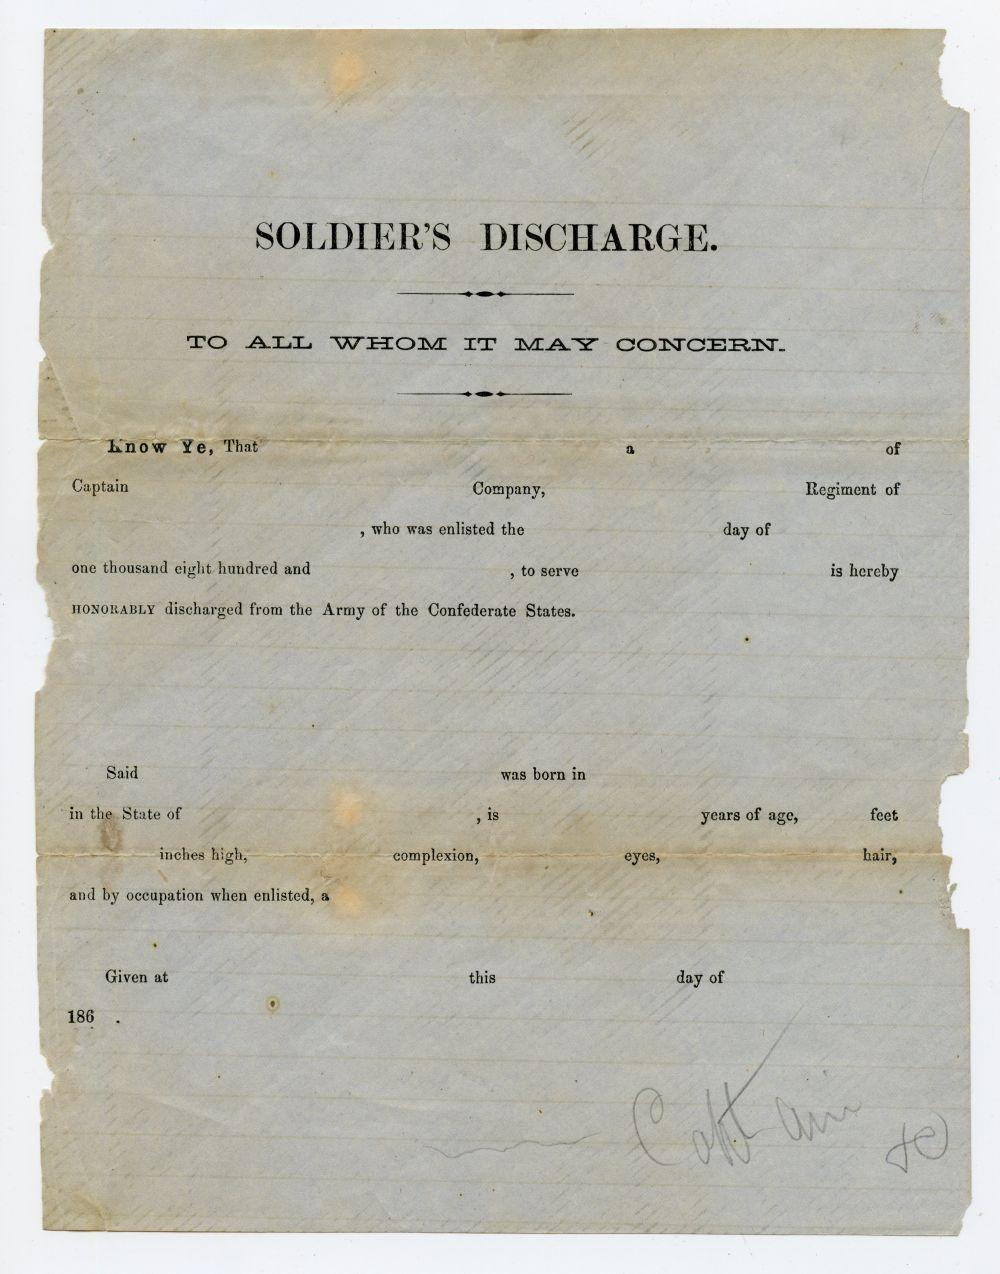 Civil War Confederate Discharge Document